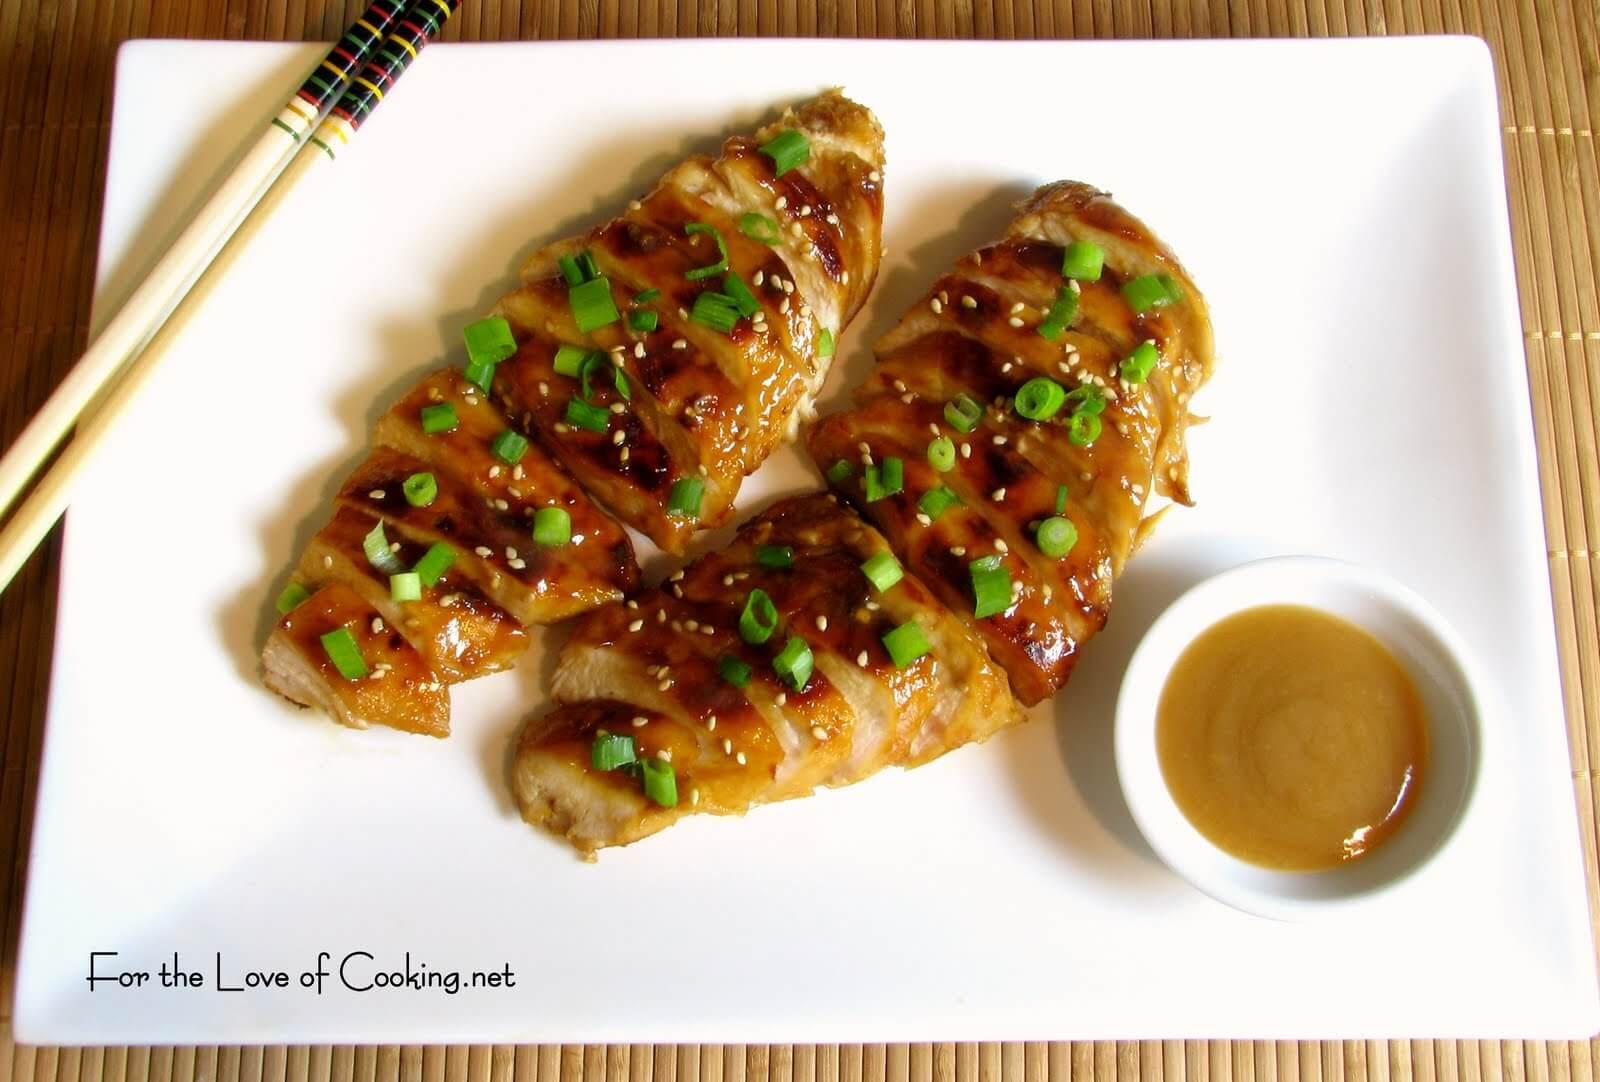 Honey-Ginger Chicken Breasts